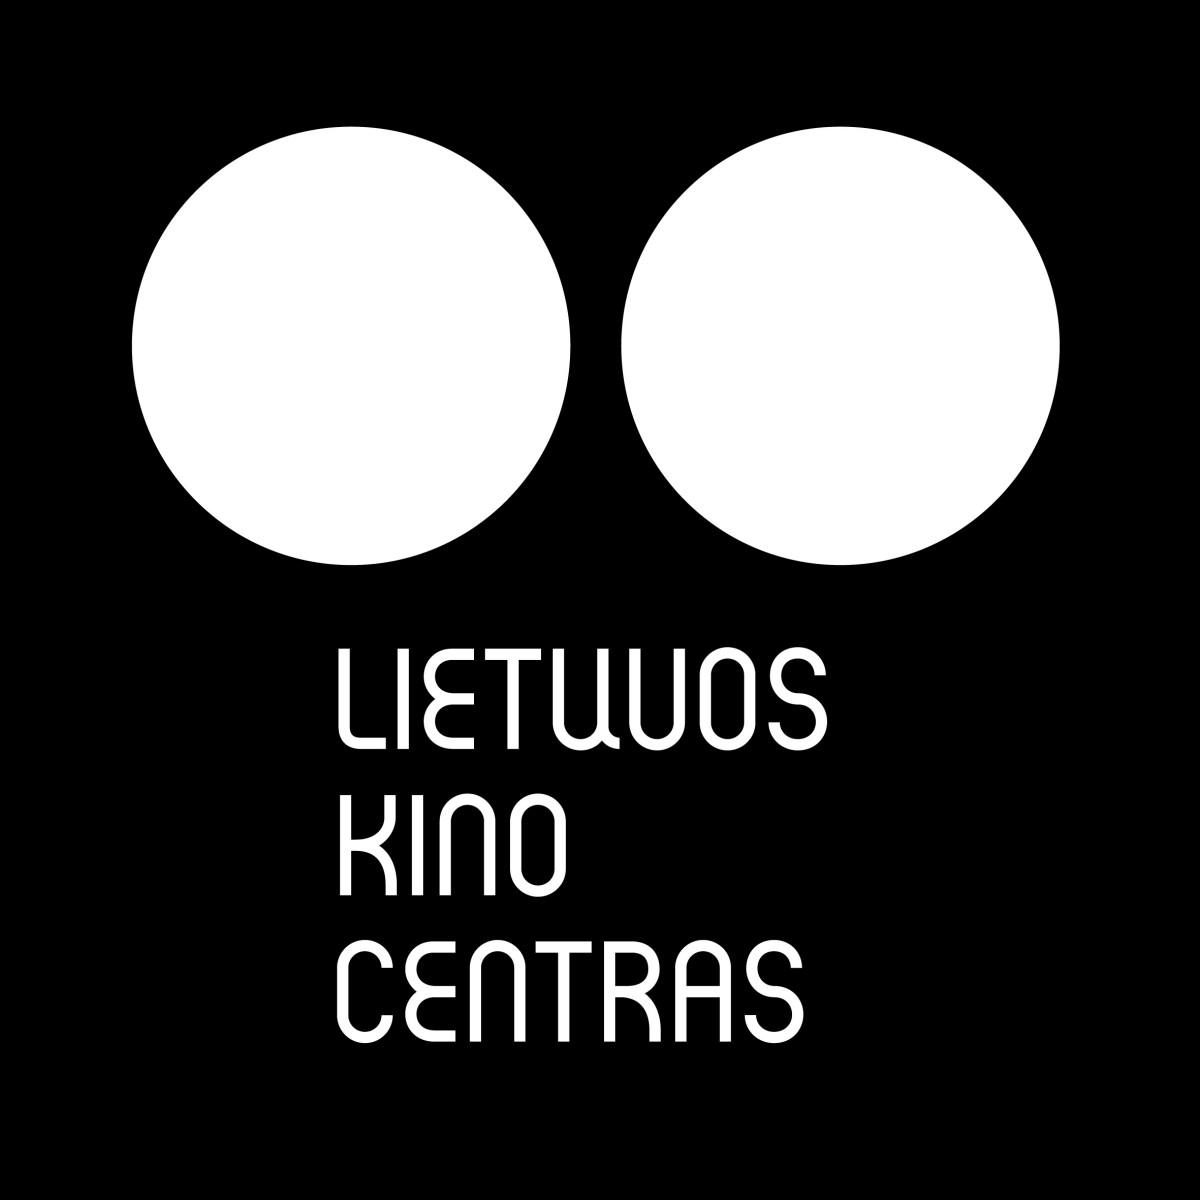 lietuvos_kino_centras_lkc